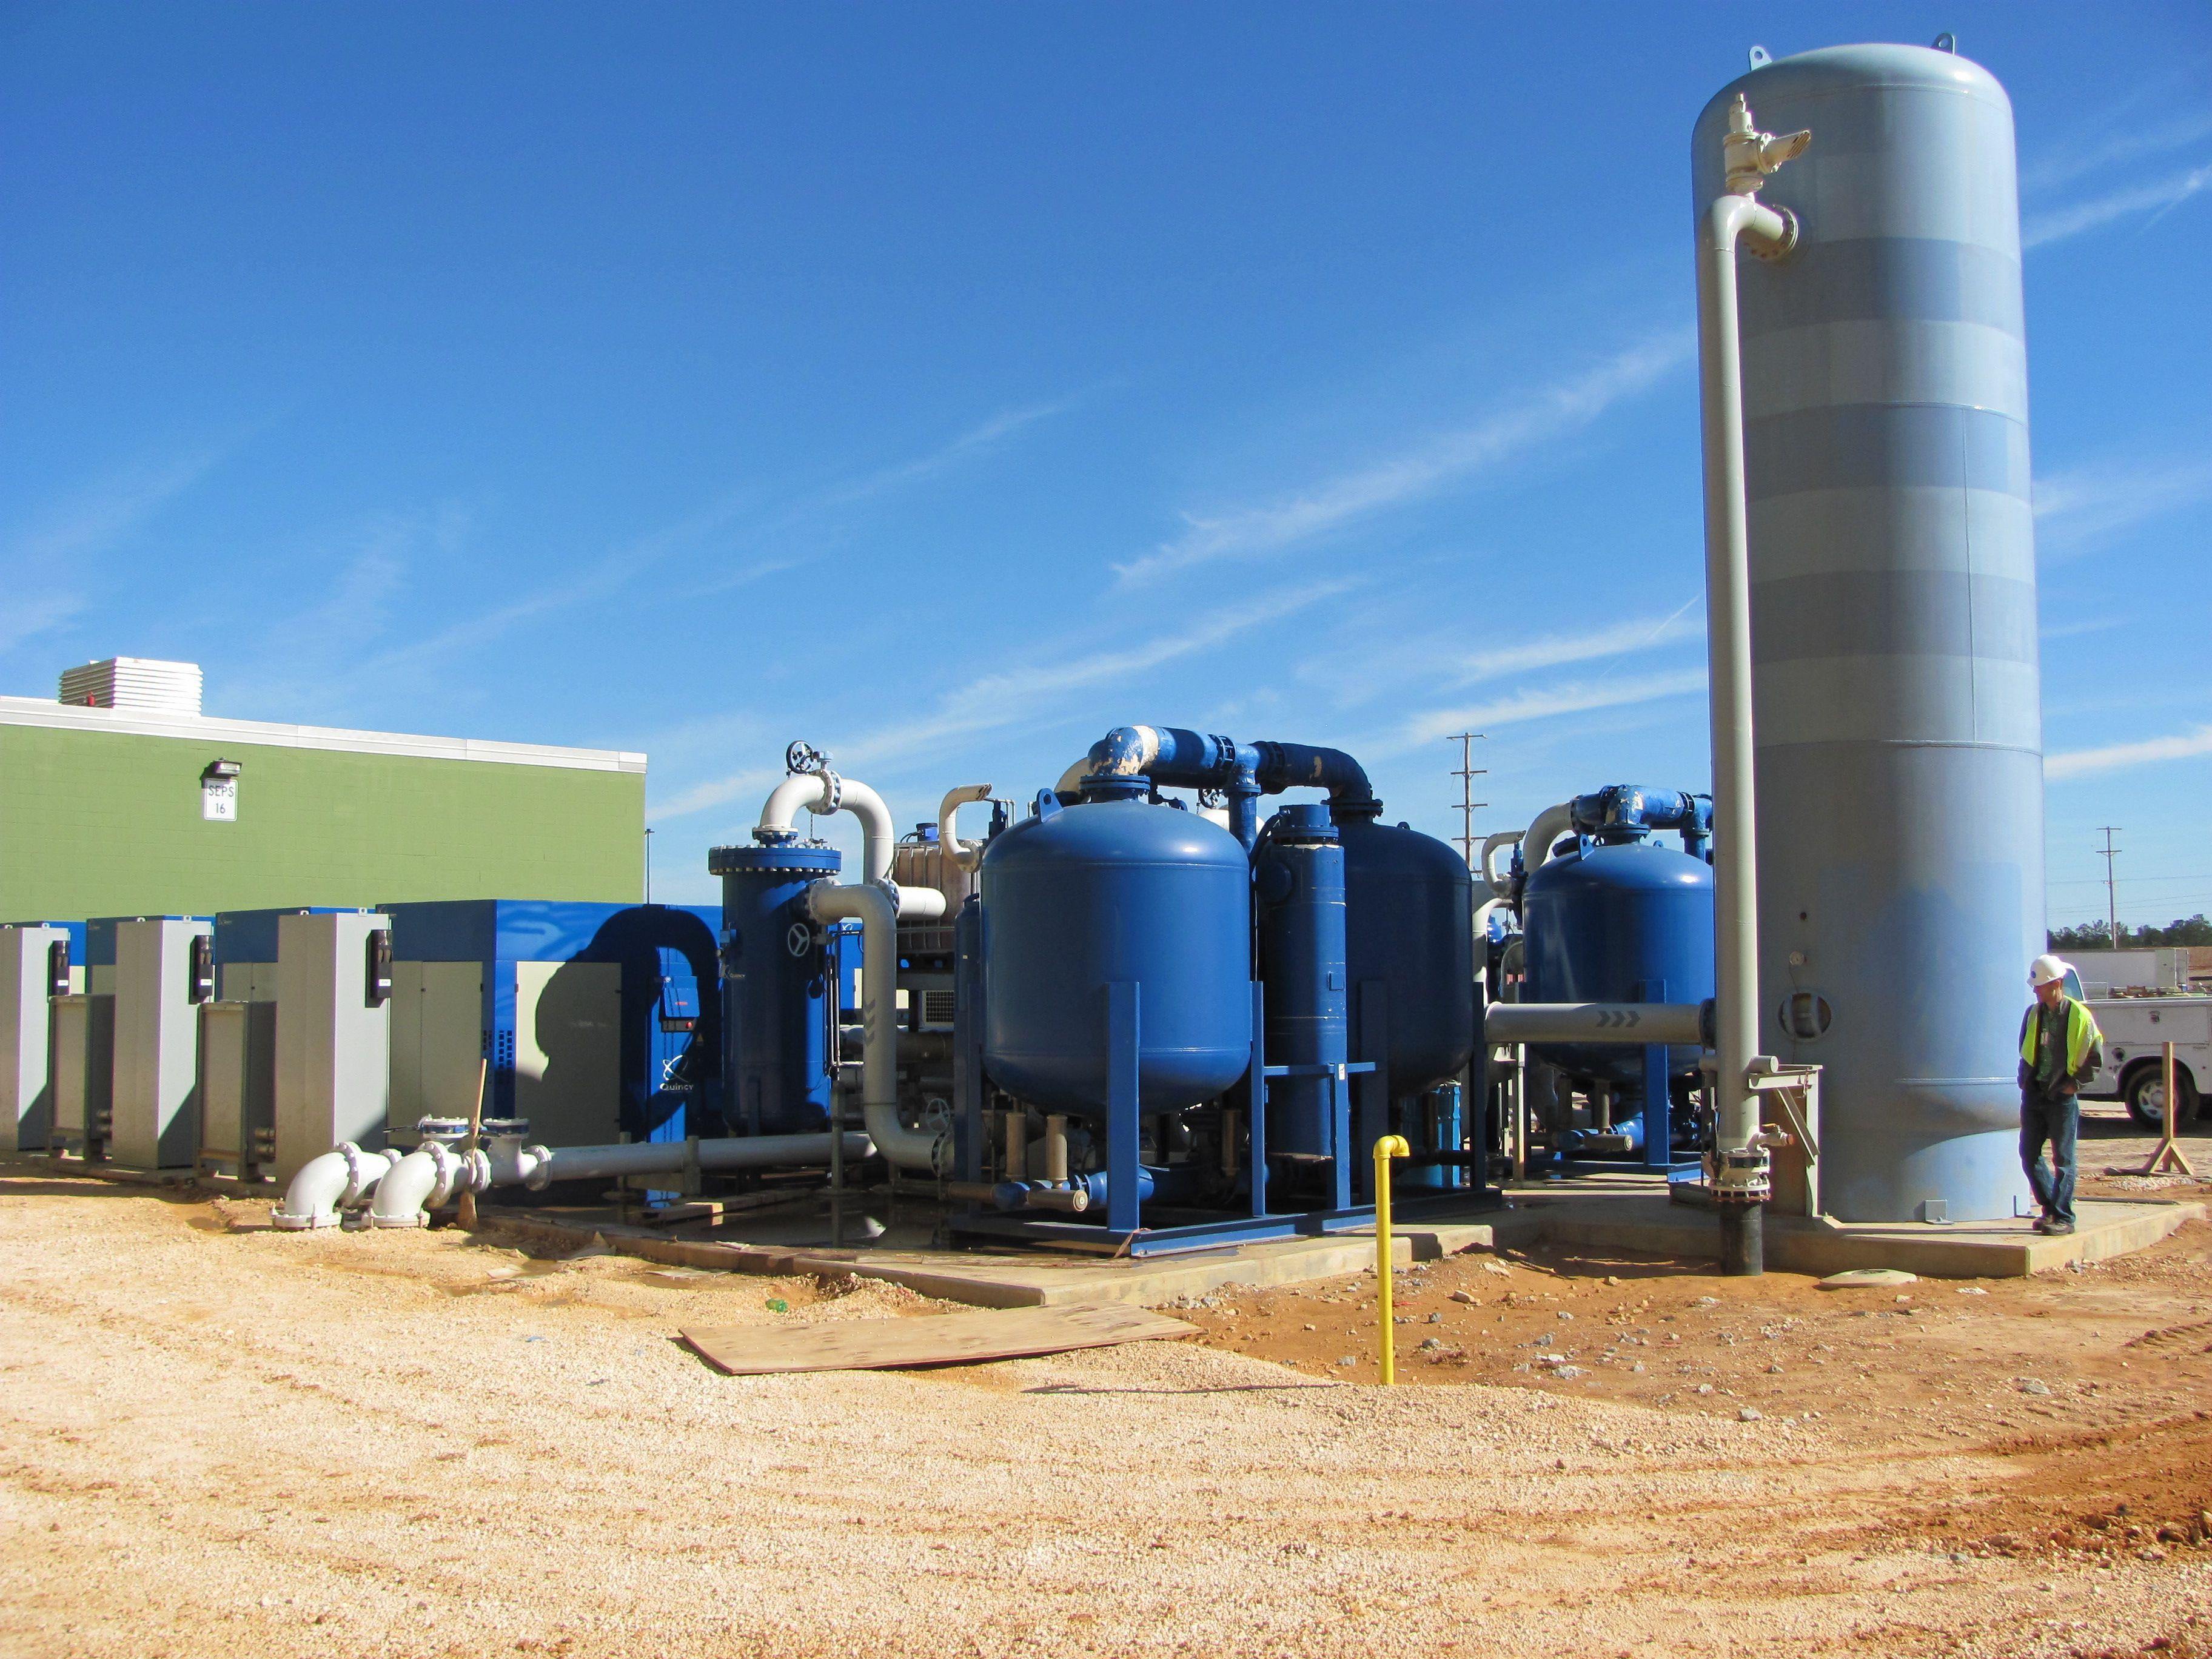 Quincy compressor installation photo Vacuum pump, Air